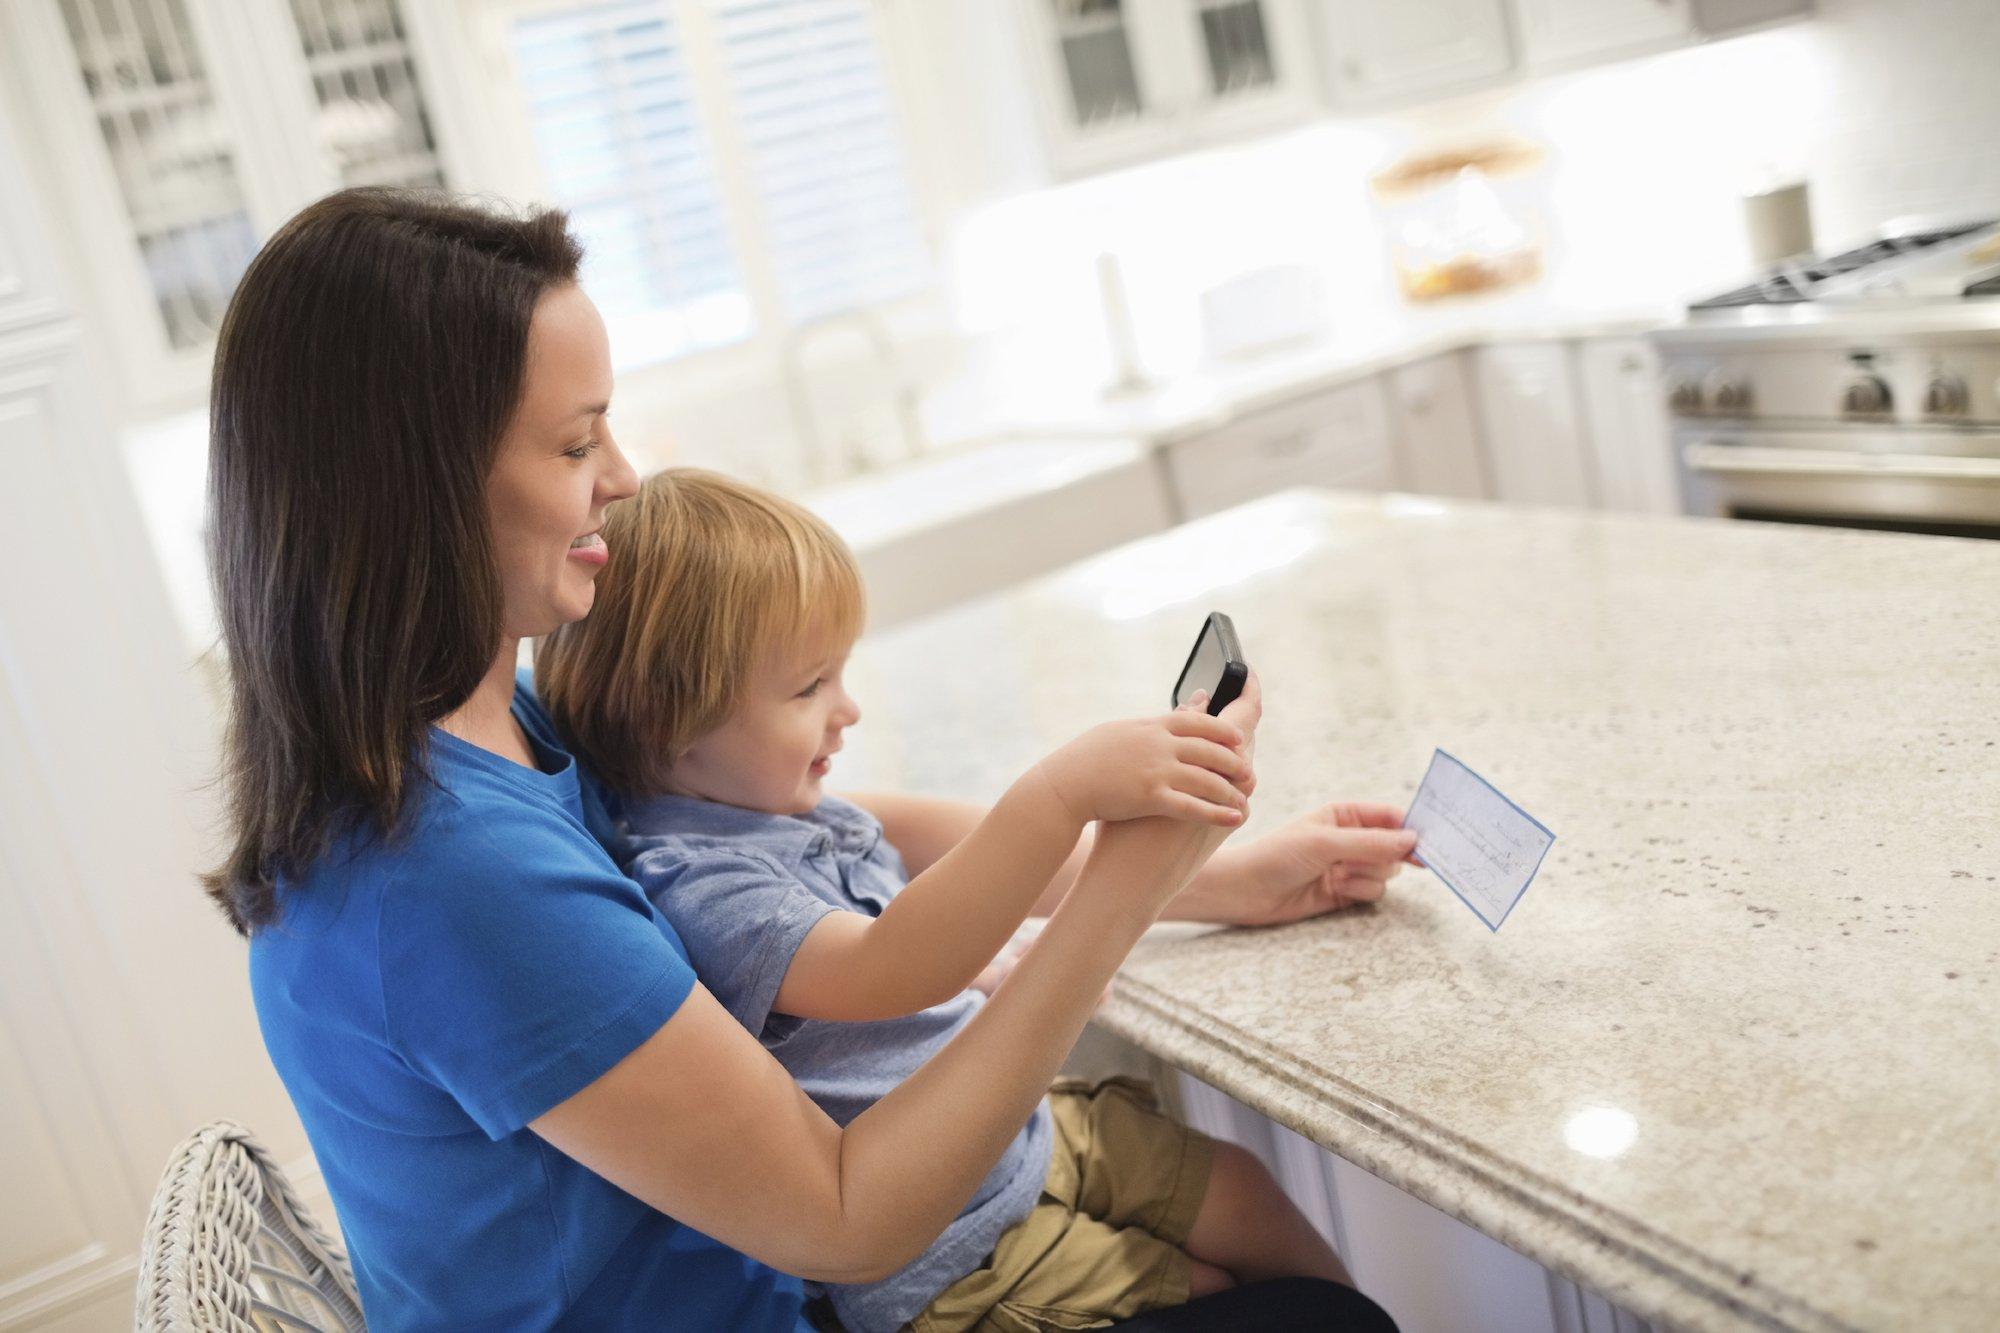 Image of woman depositing check